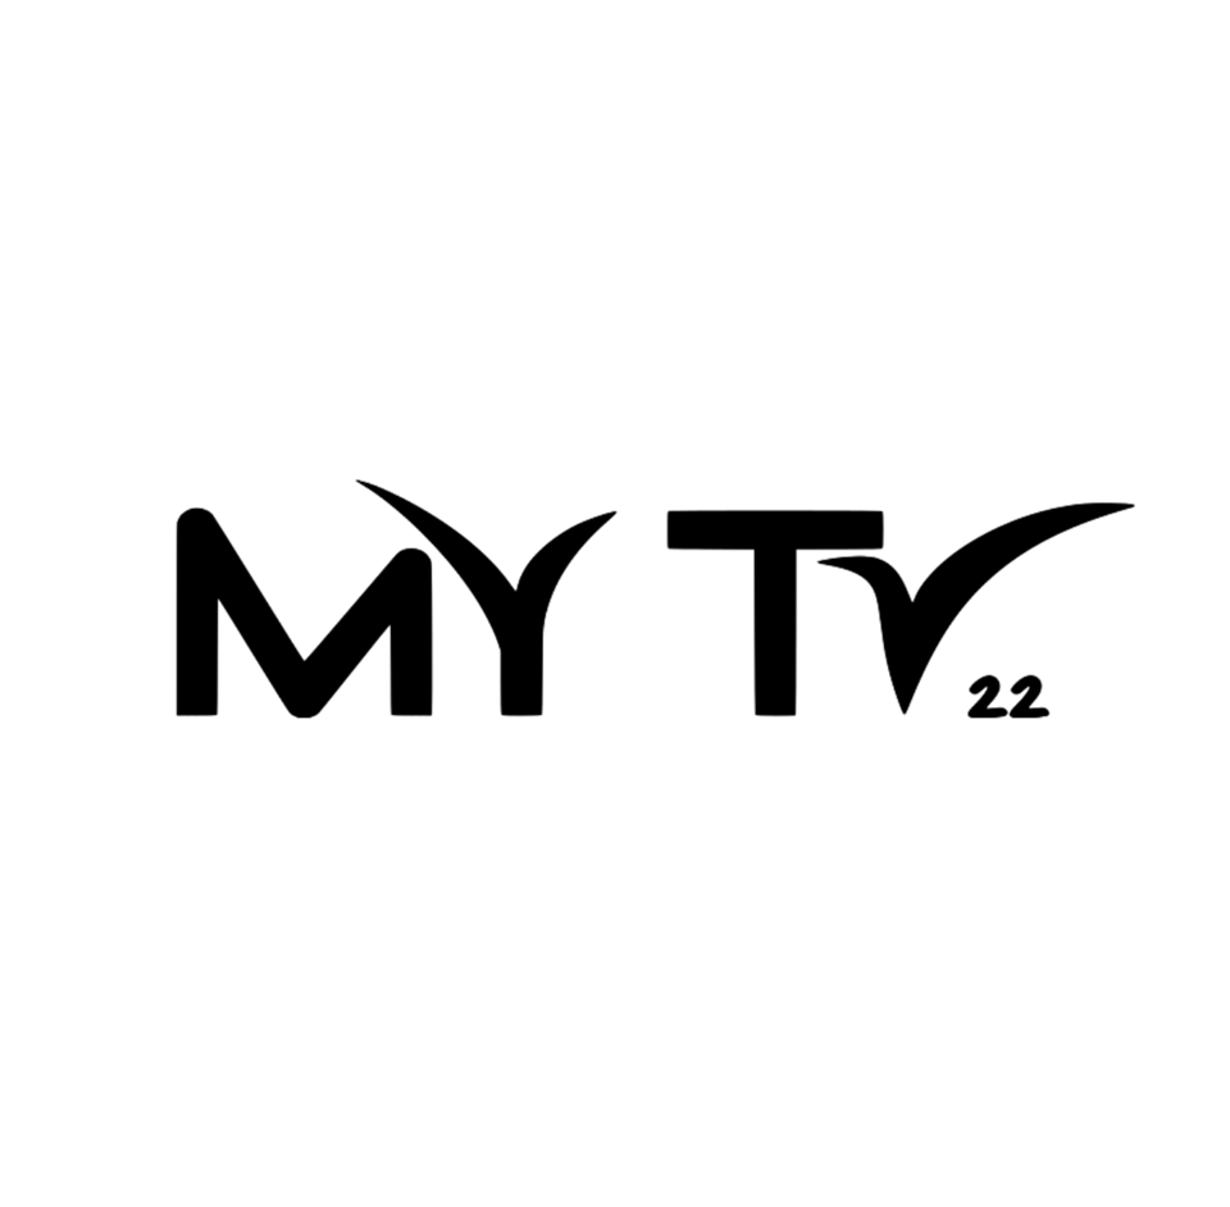 my tv 22